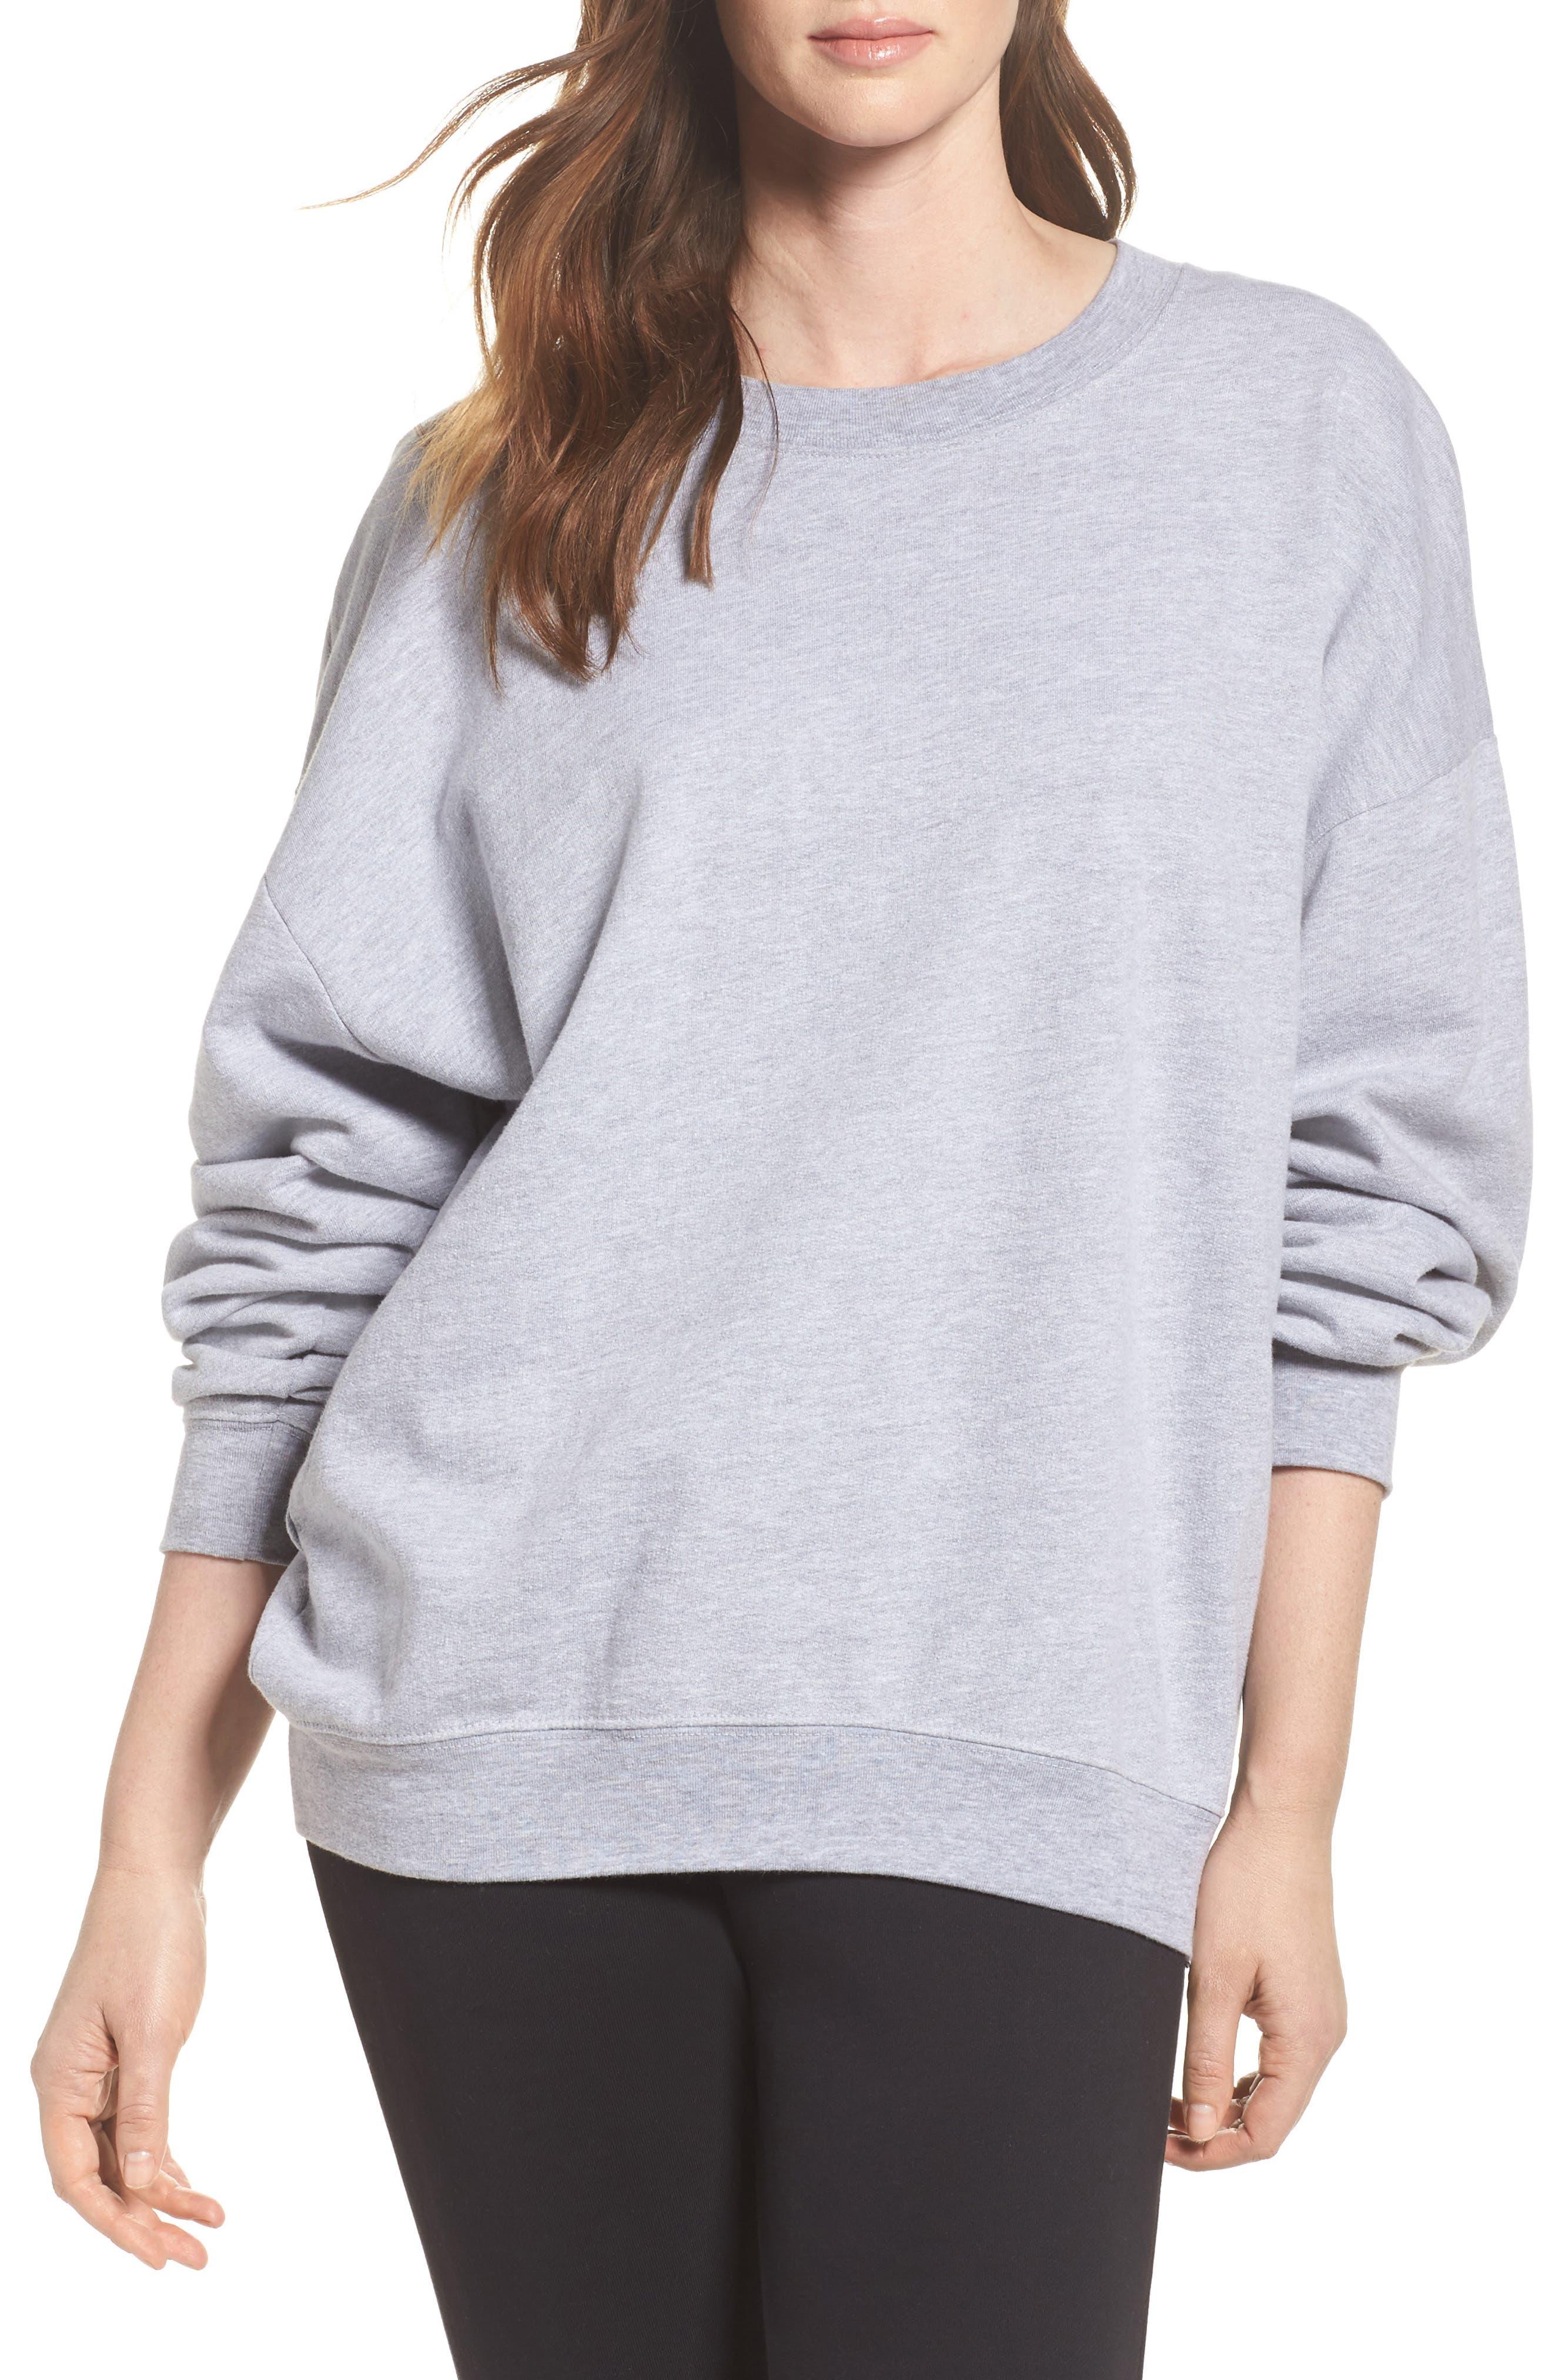 Ellstan Oversize Boyfriend Sweatshirt,                         Main,                         color, 035